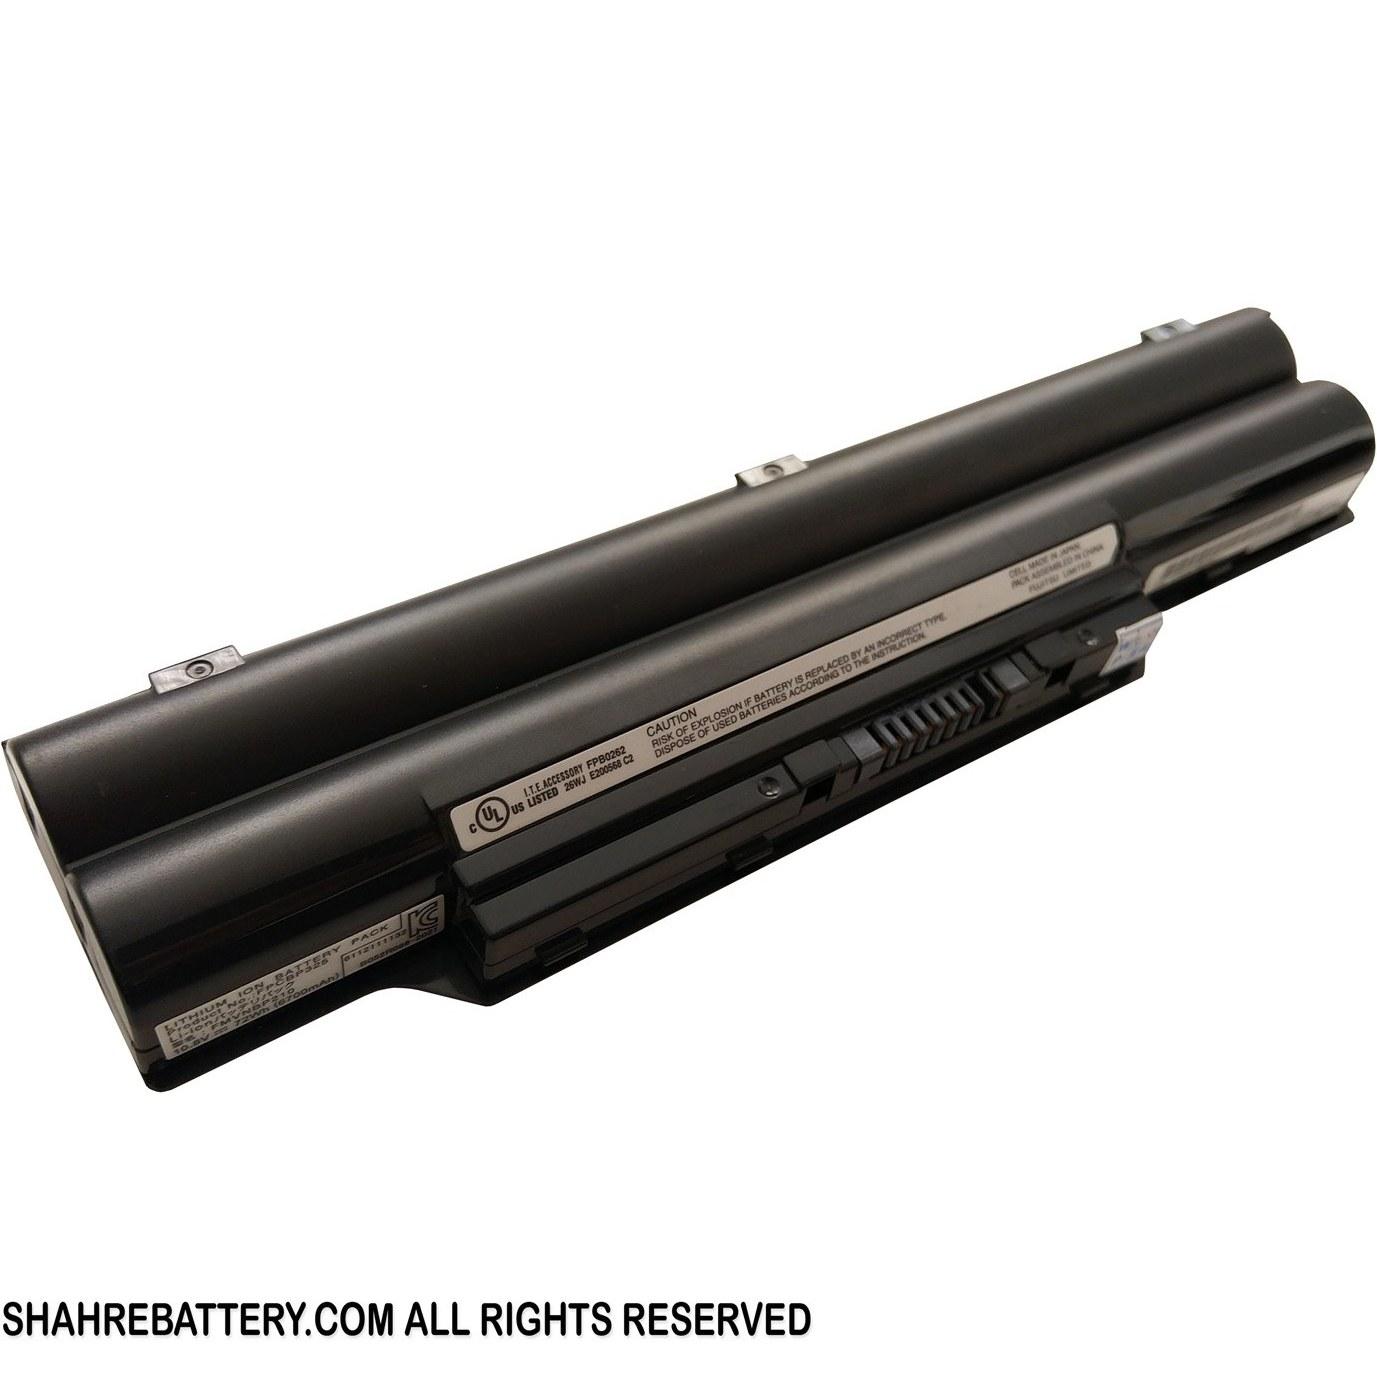 تصویر باتری اورجینال لپ تاپ فوجیتسو Fujitsu S751 S761 FPCBP325 Fujitsu S751 S761 FPCBP325 Original Battery